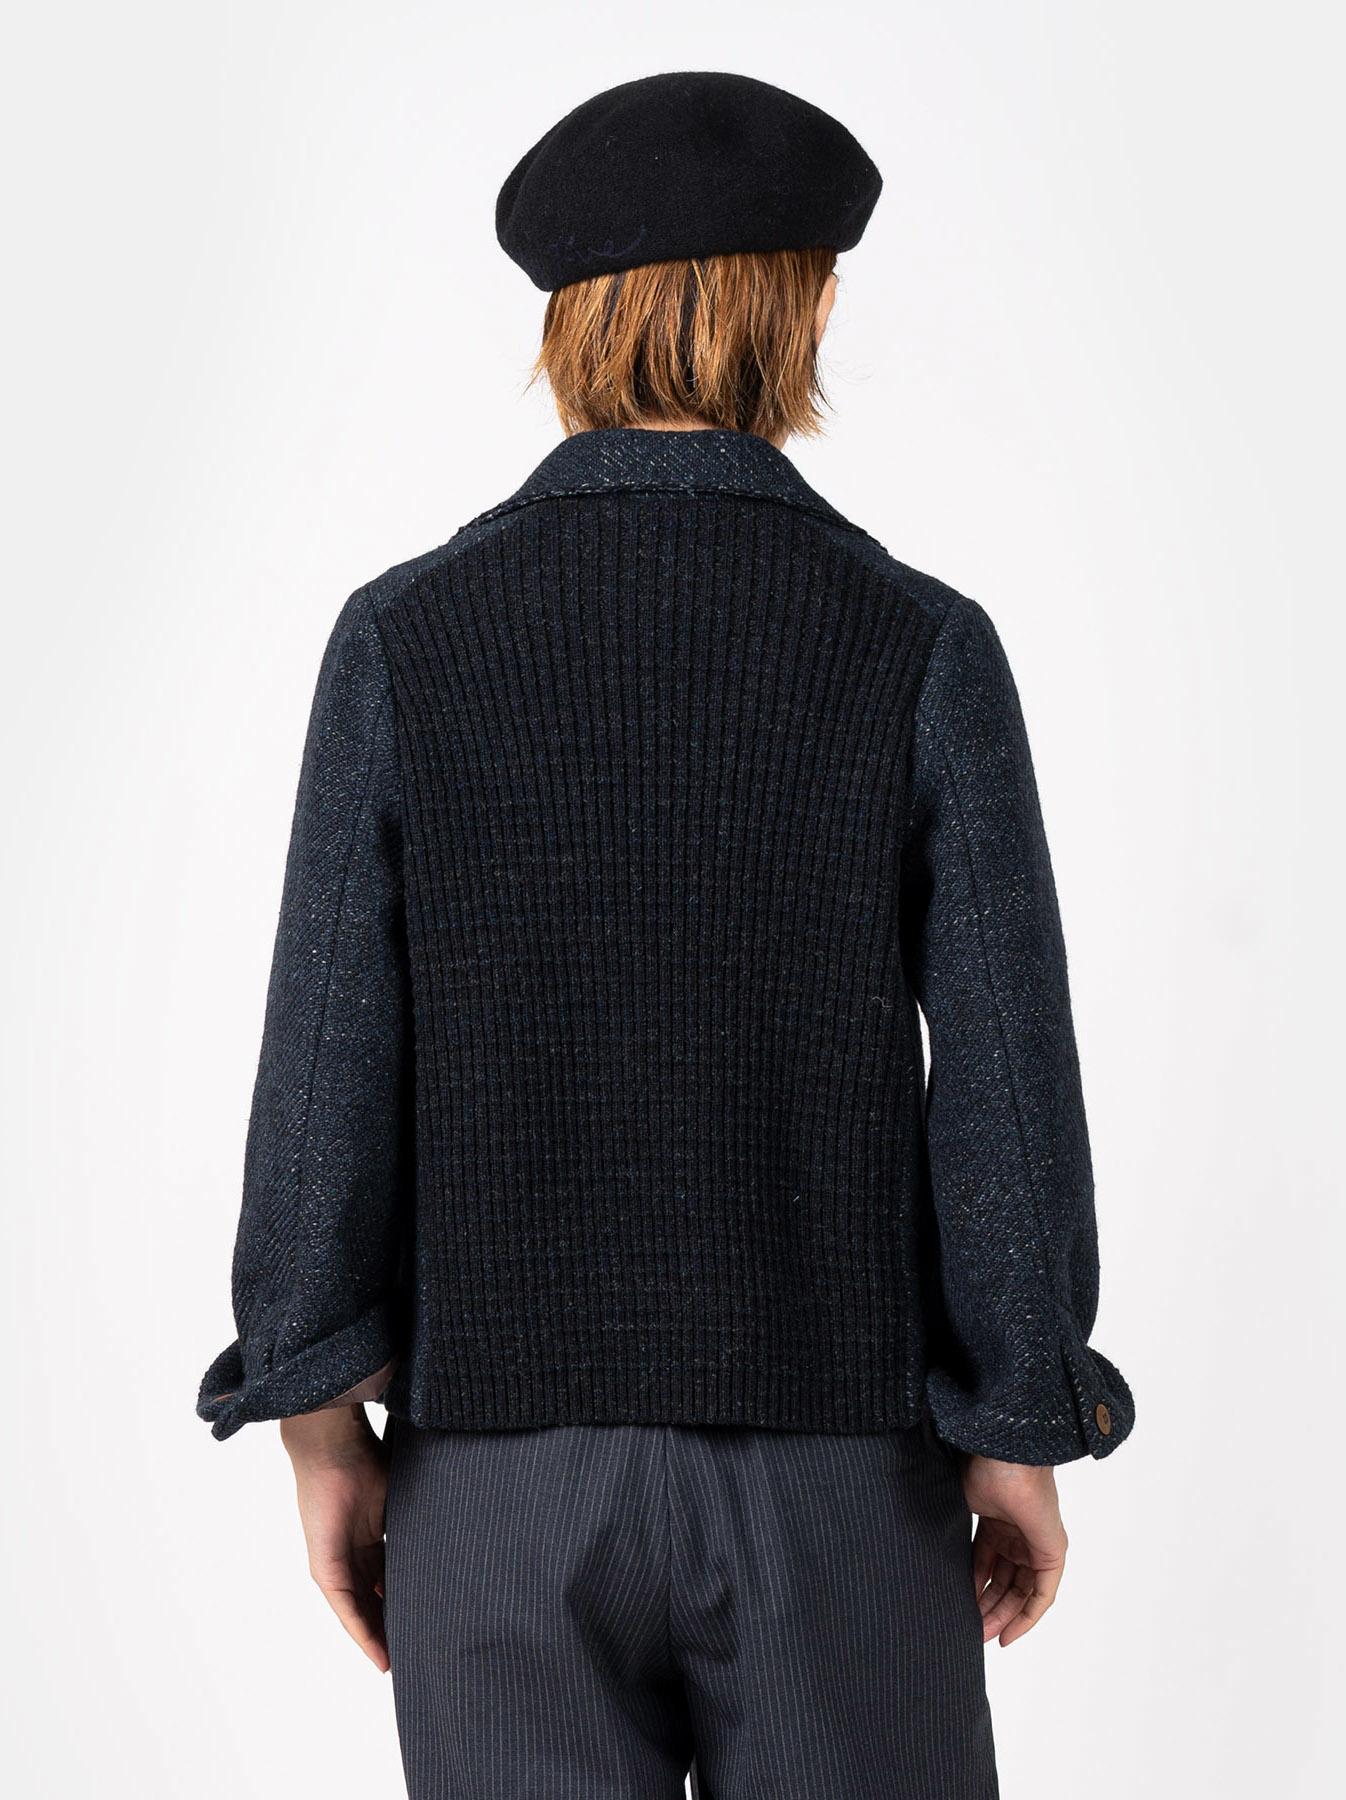 Mixed Tweed Knit Jacket-5